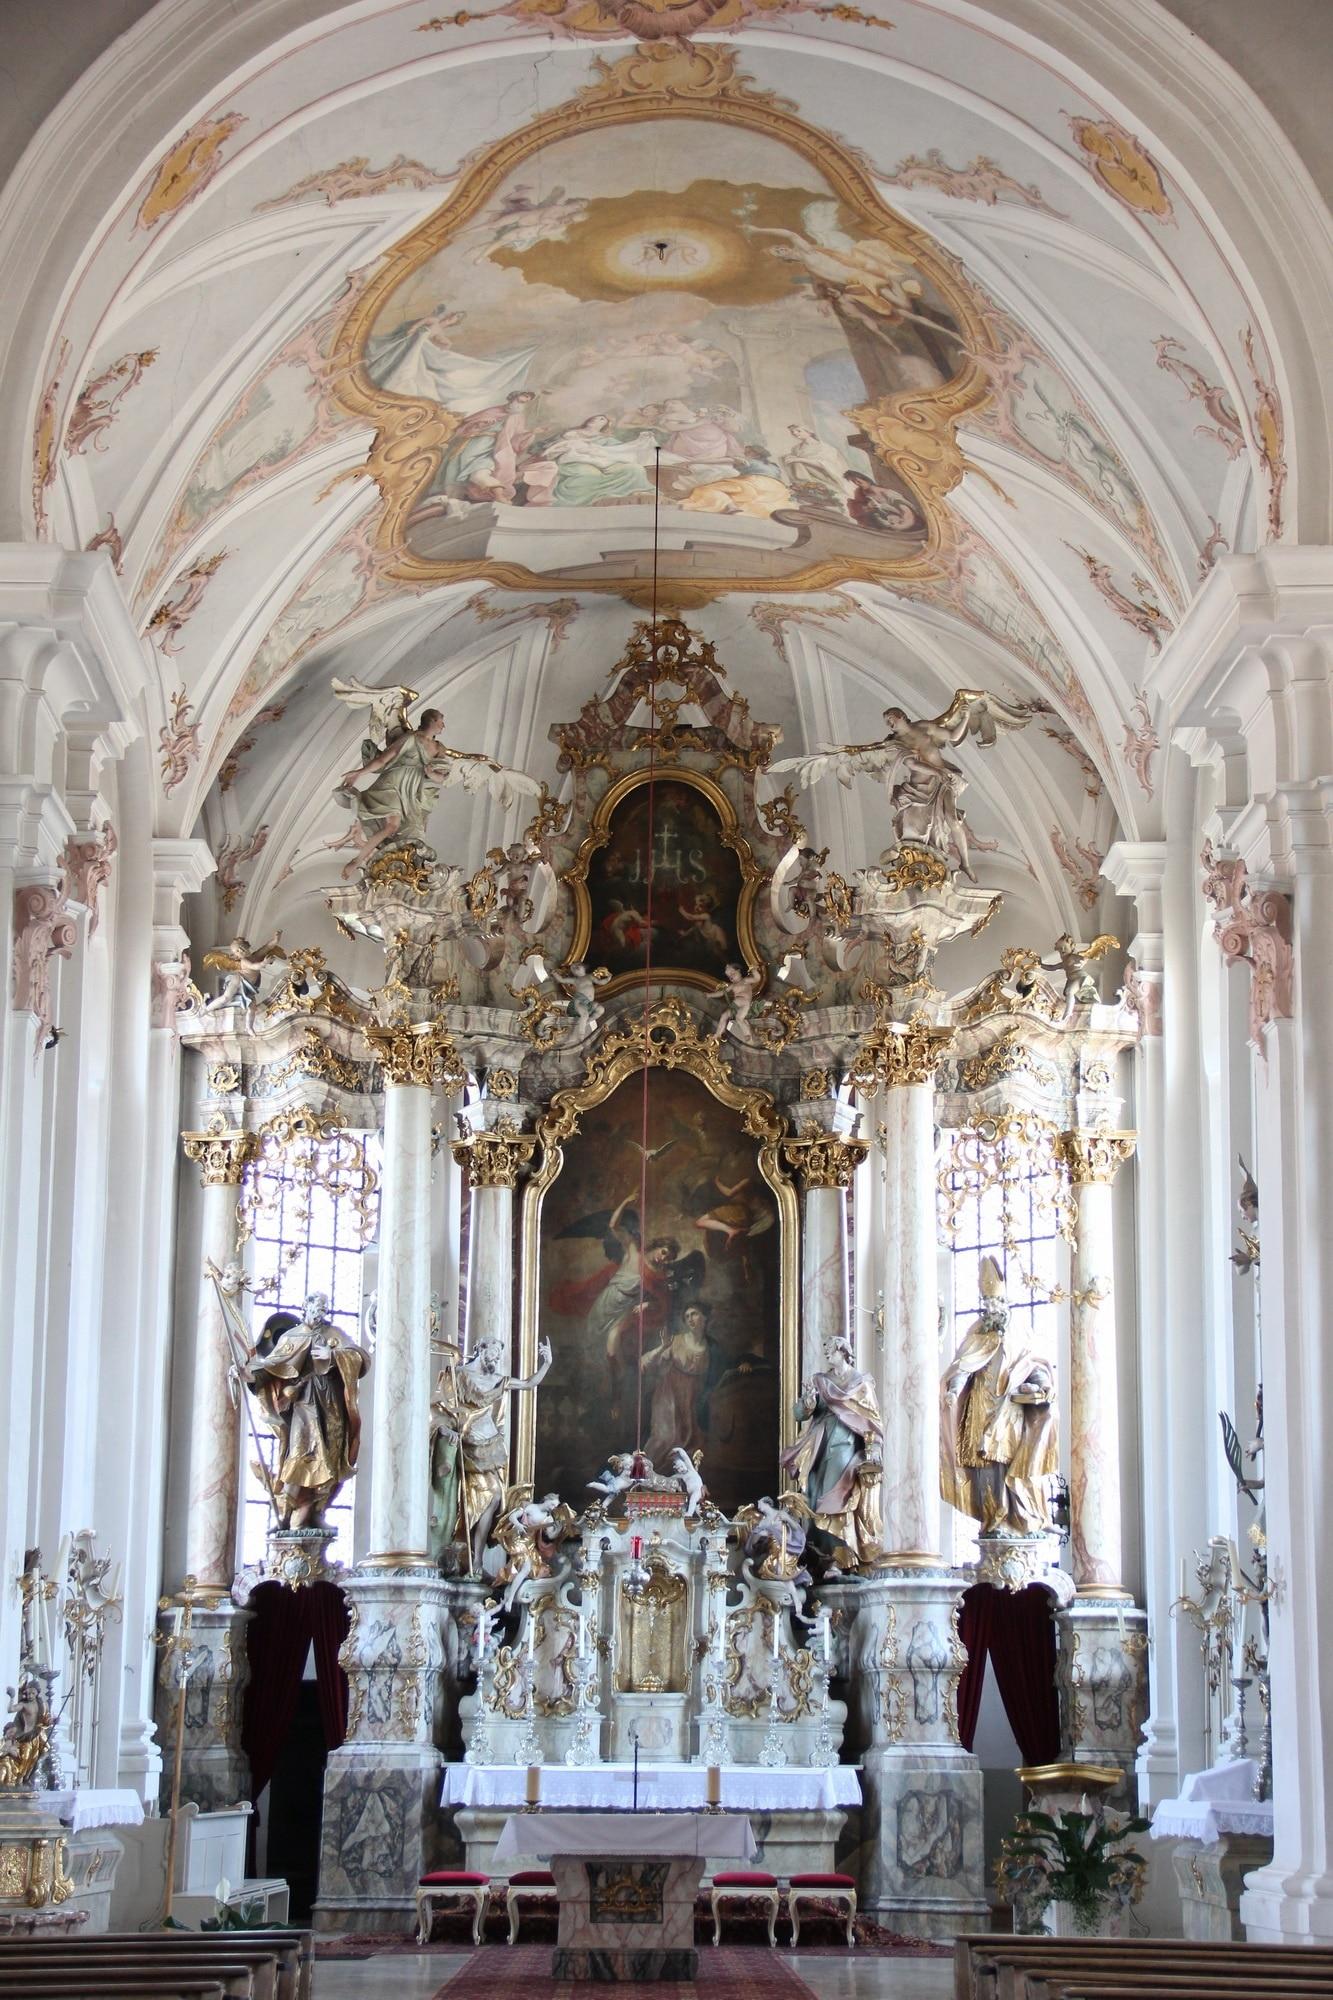 Erding, Bavaria, Germany